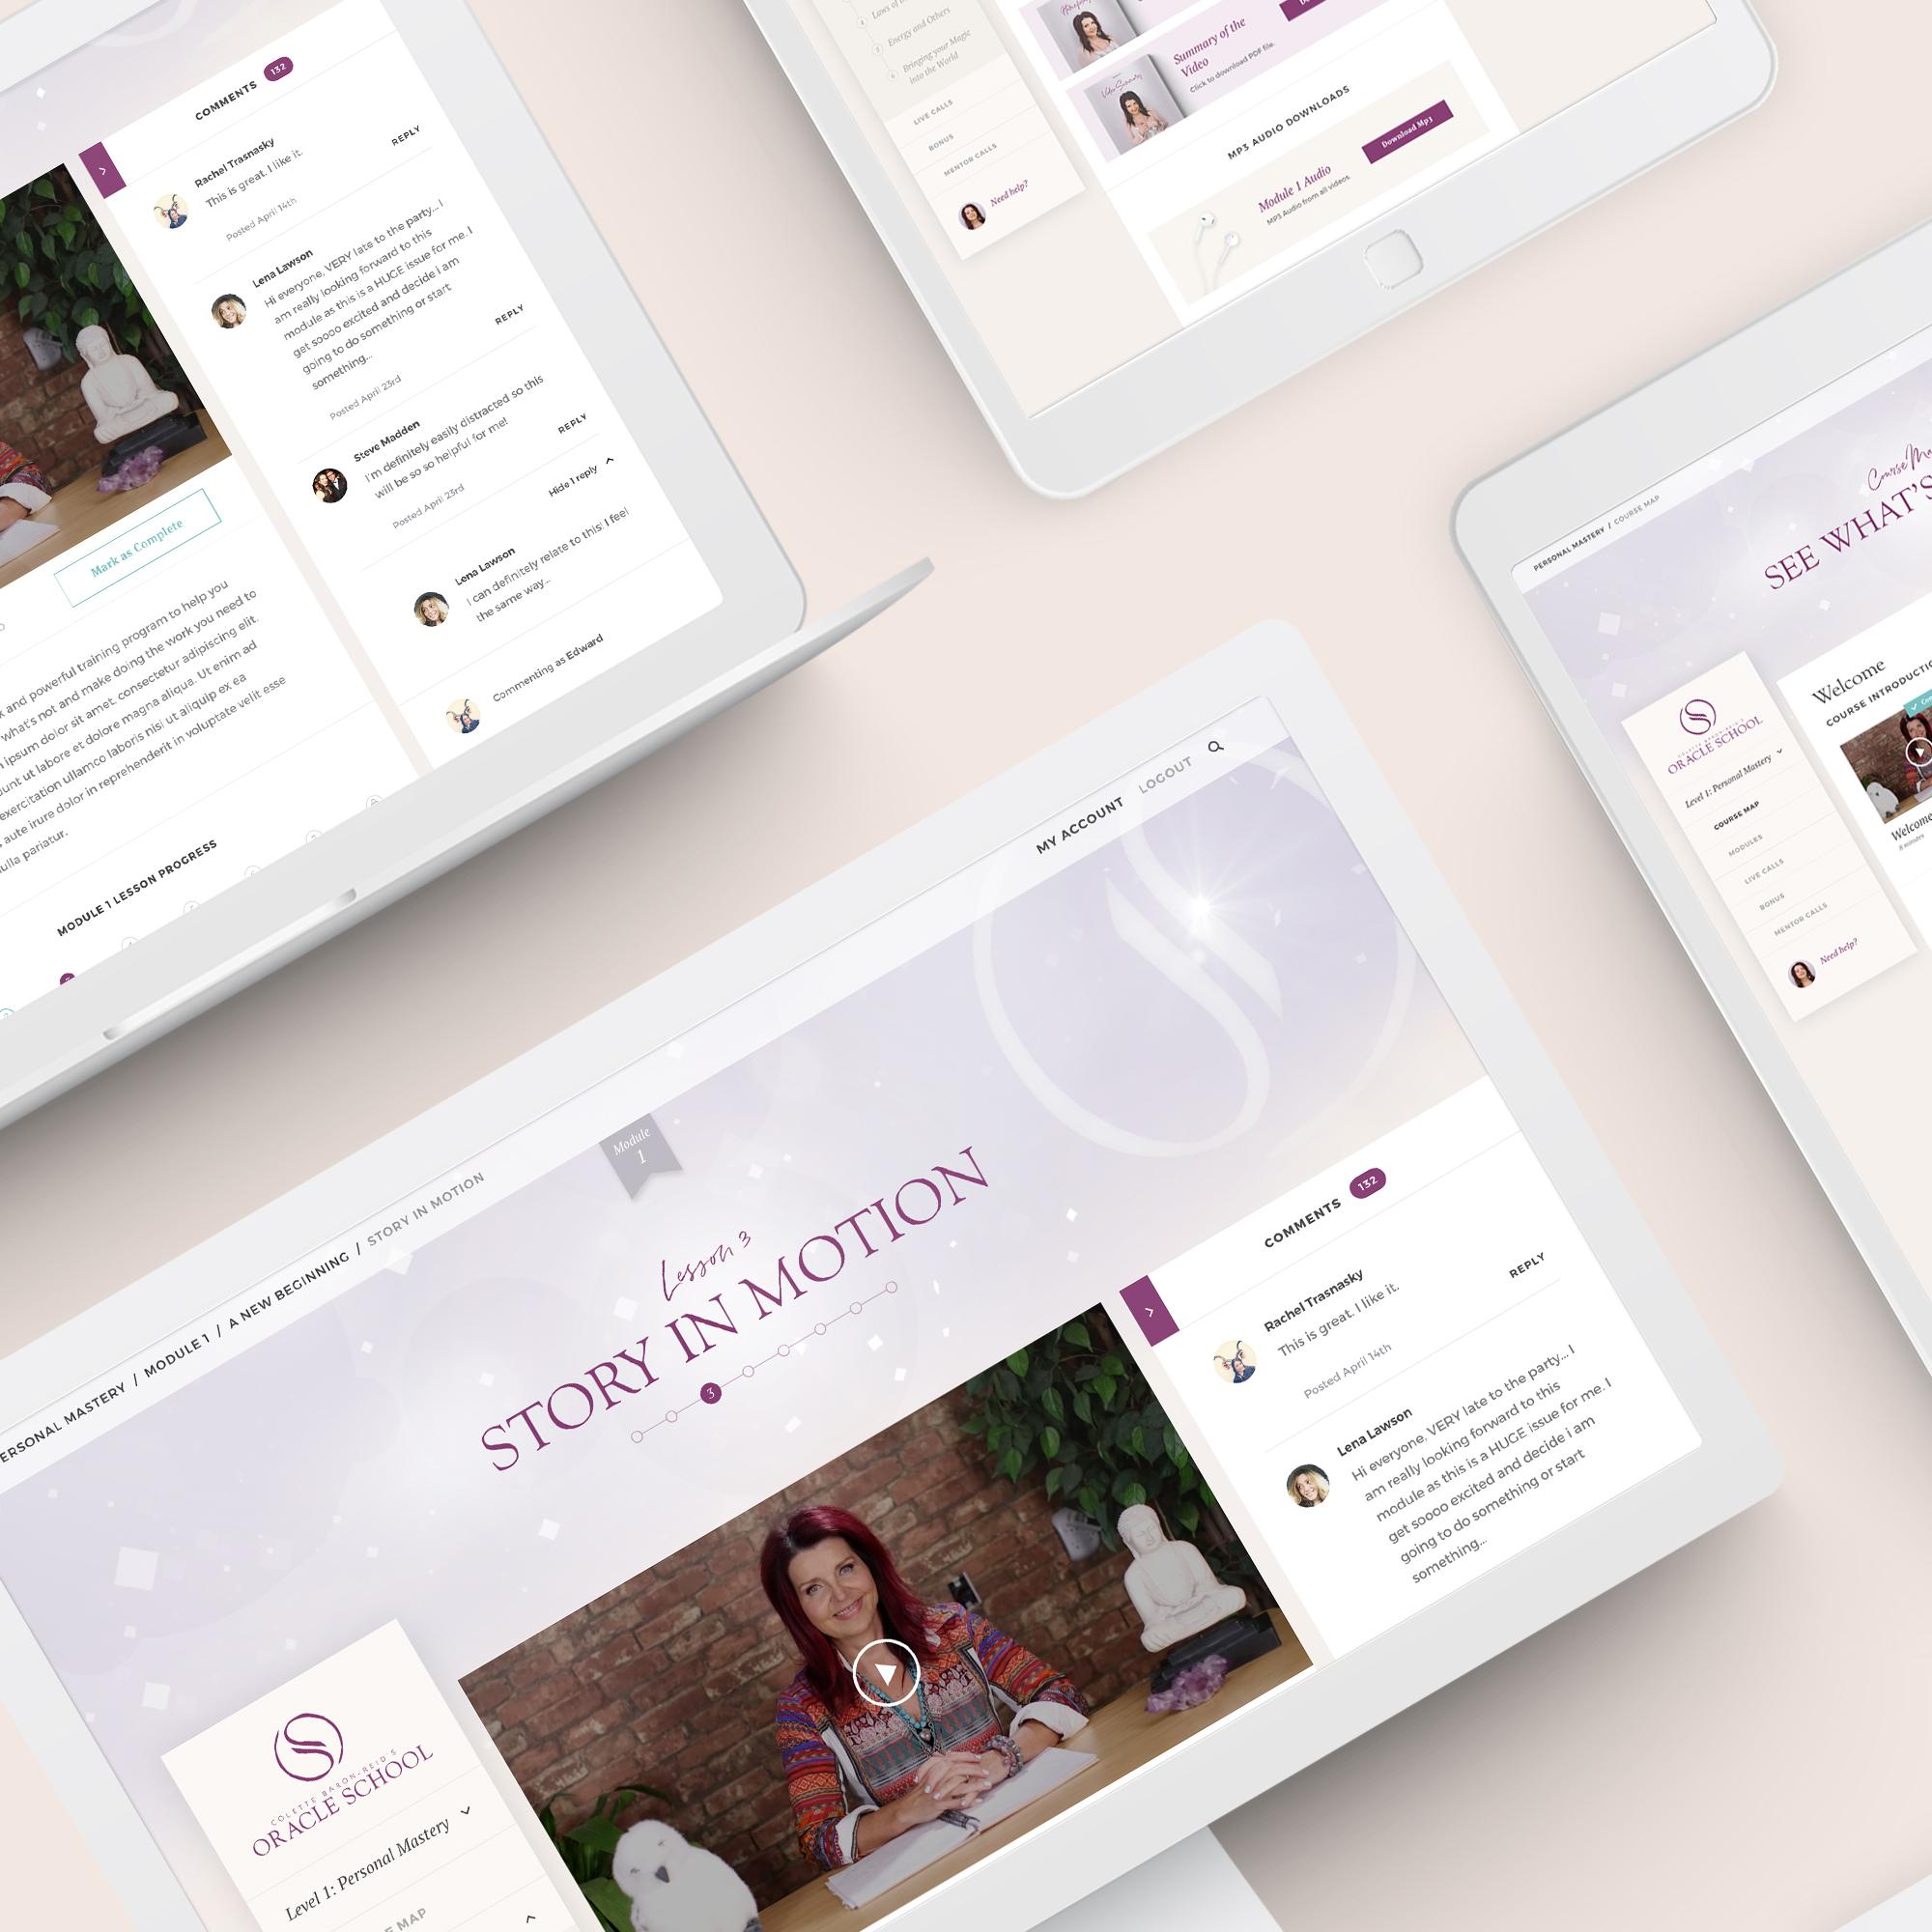 Colette Baron-Reid - Oracle School - web design, ux design